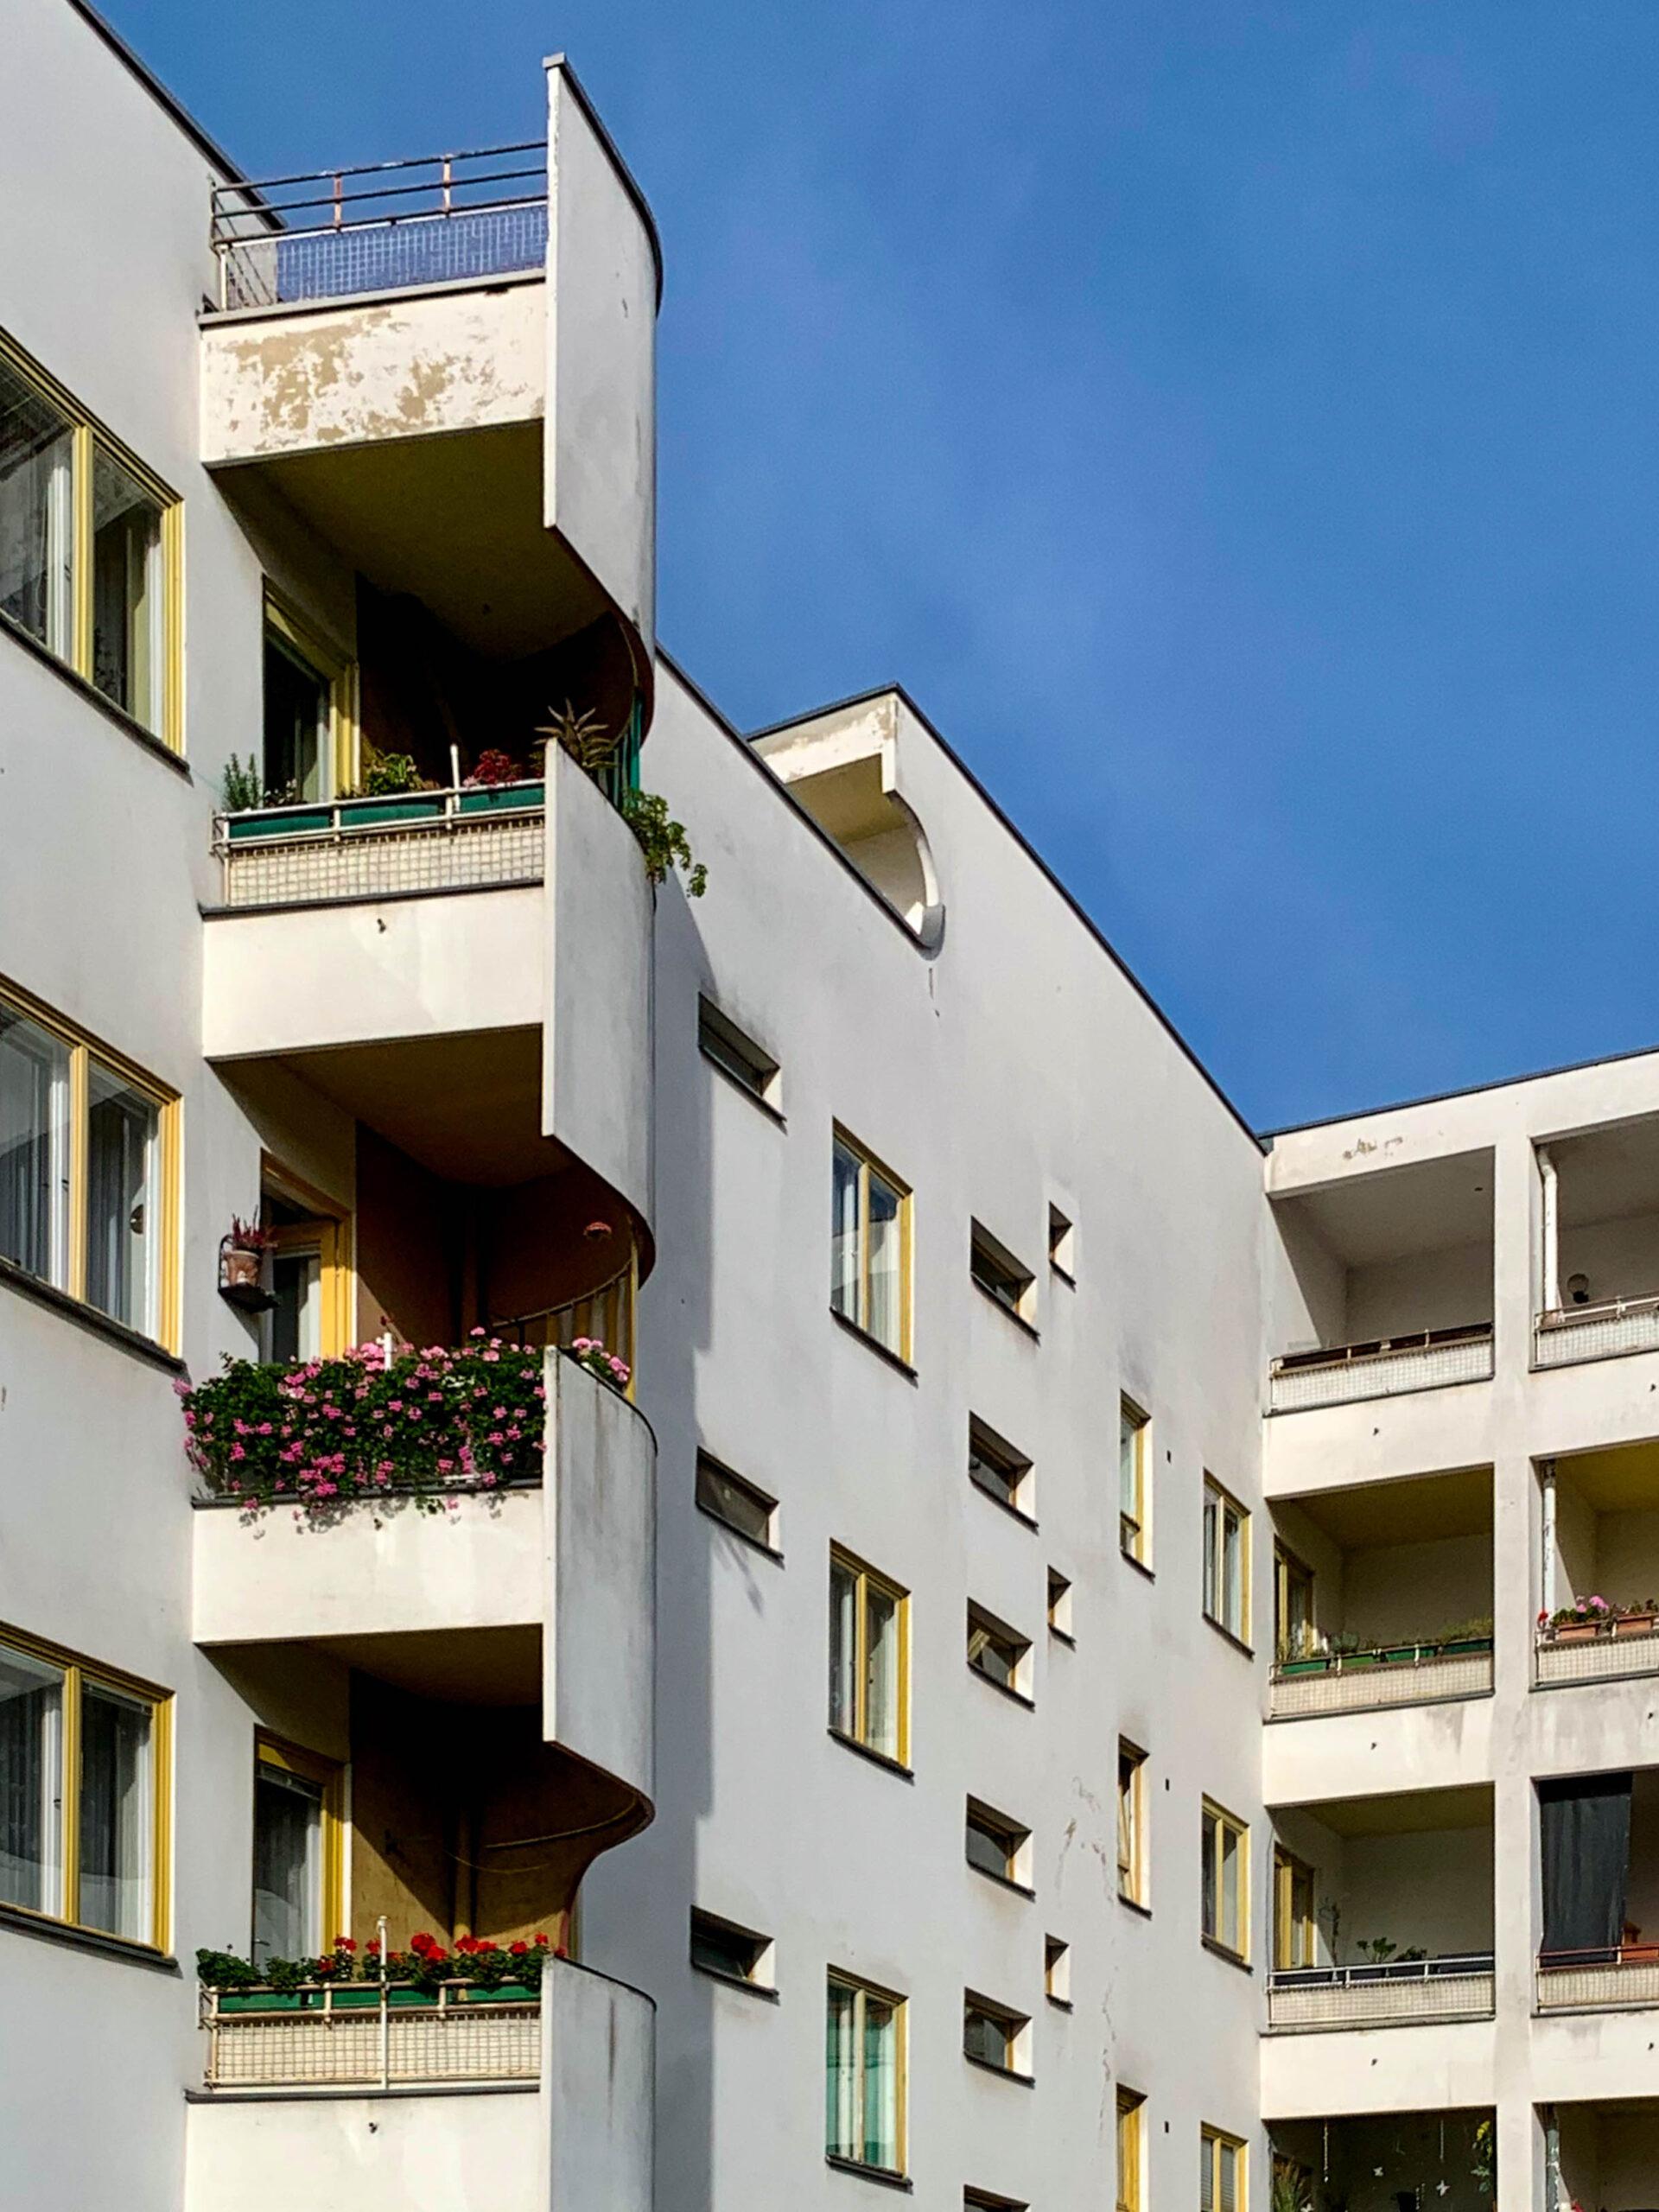 Residential complex v, 1929-1930. Architect: Hans Scharoun